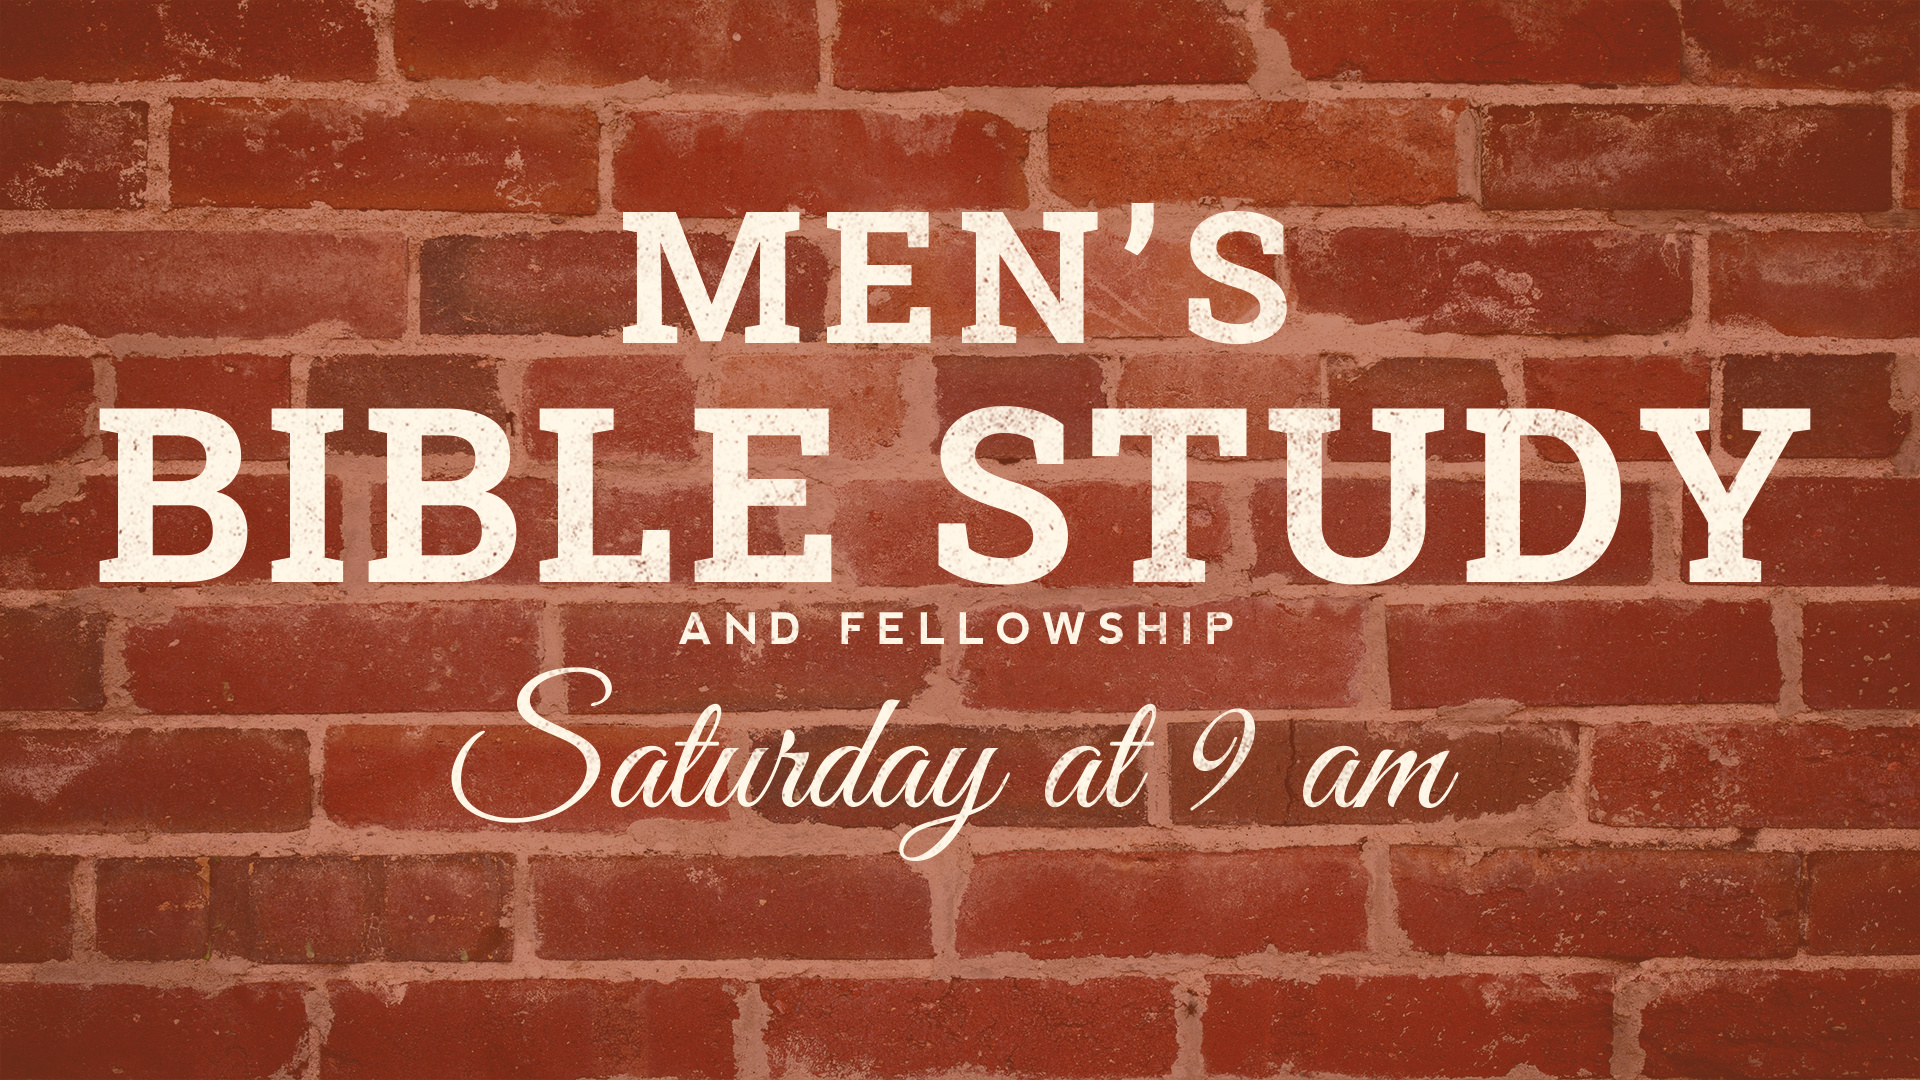 Men's Bible Study and Fellowship Saturday, Feb. 29 at 9 AM